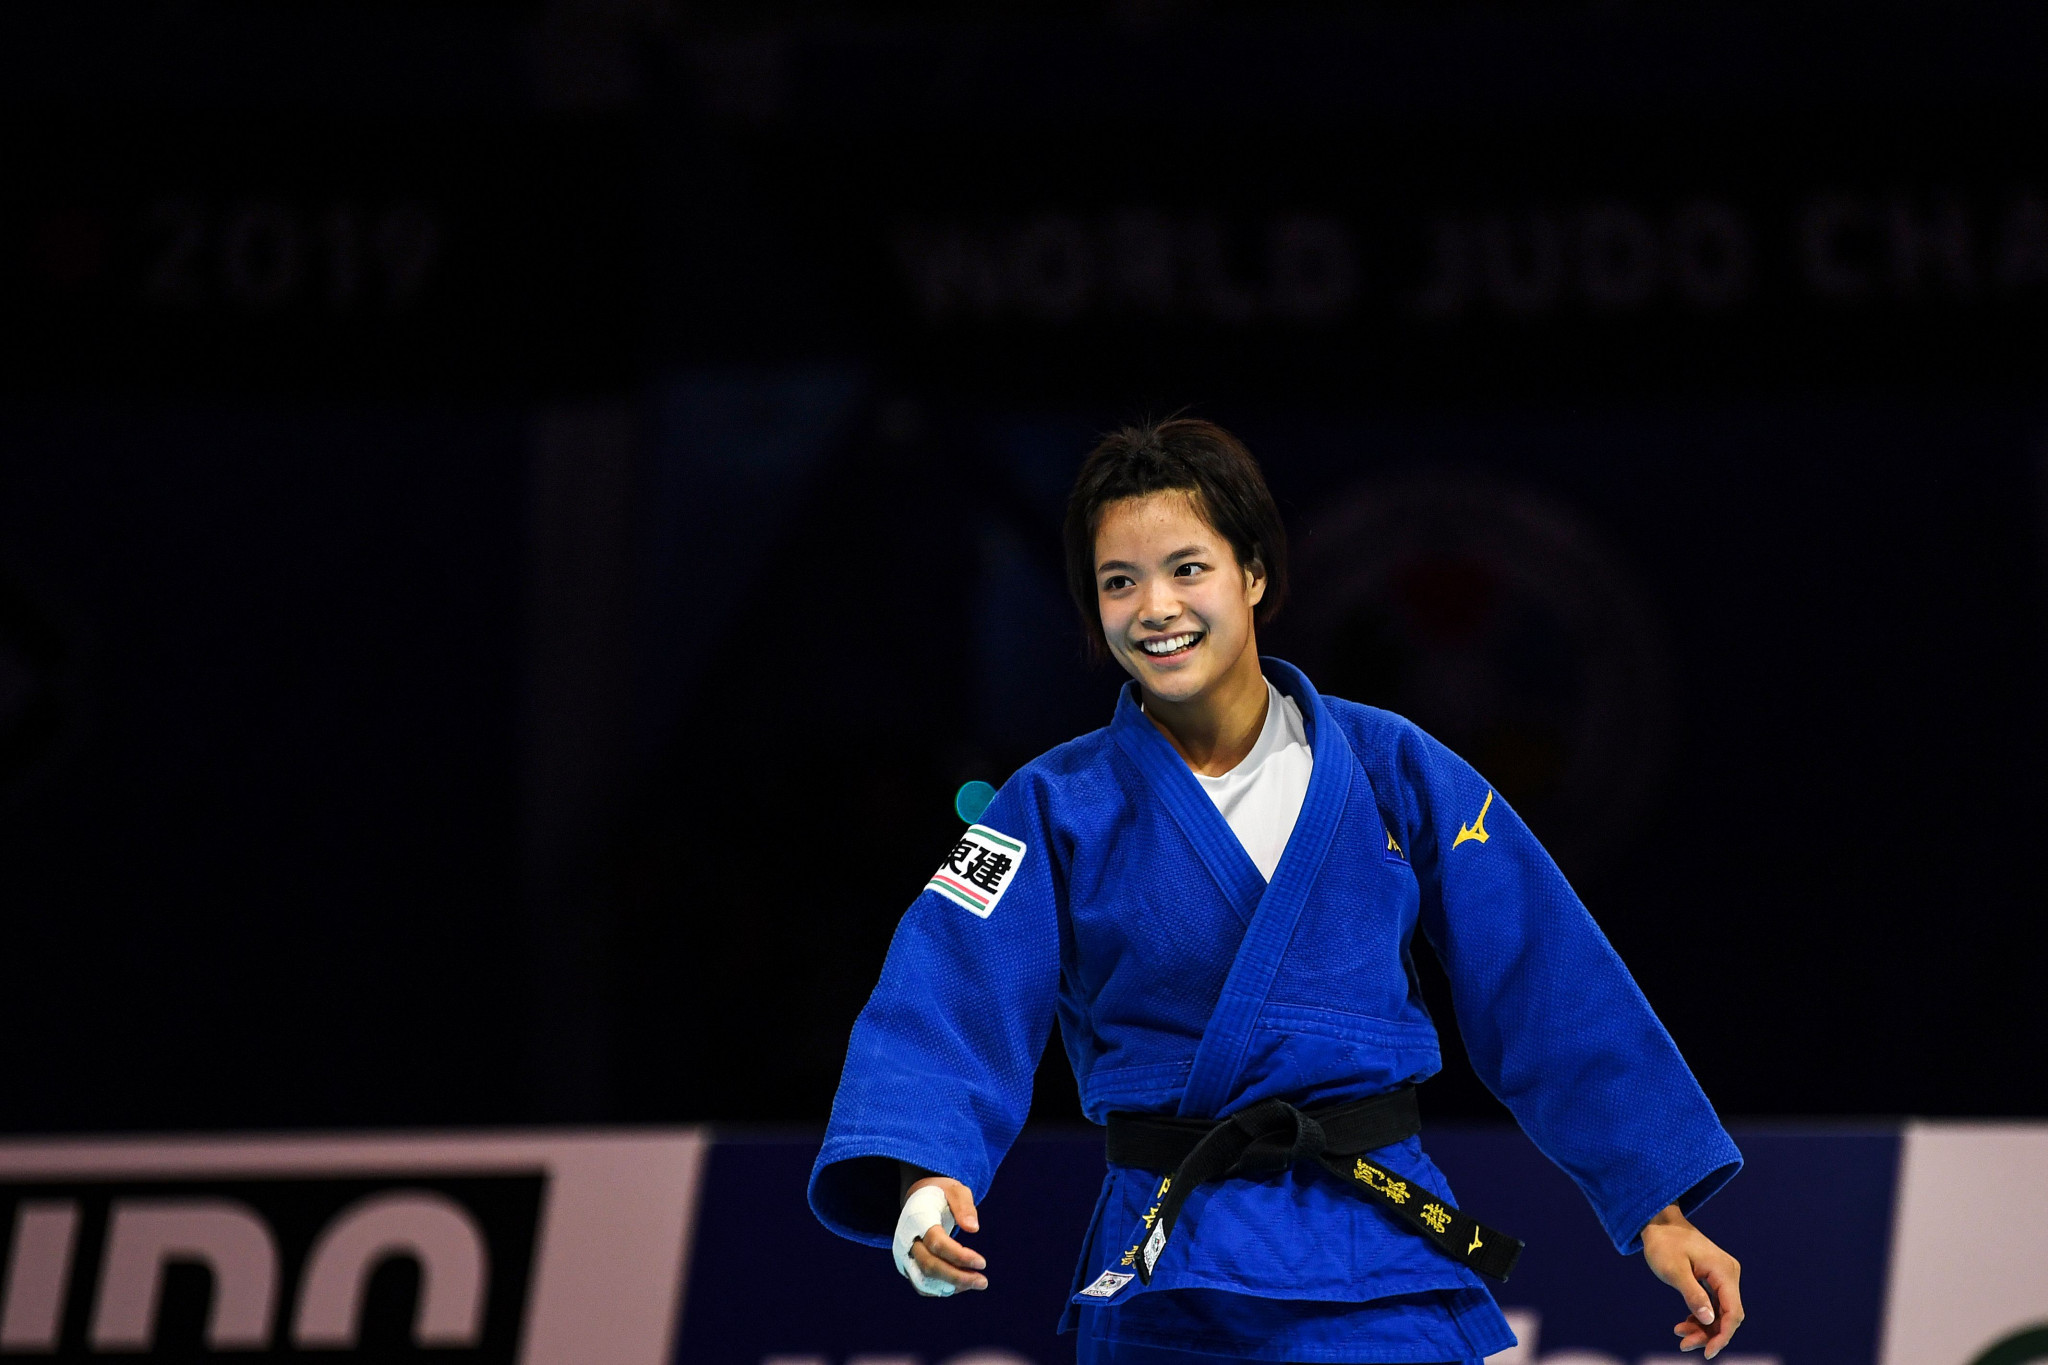 Japanese judokas earn three gold medals as IJF Grand Slam in Düsseldorf begins